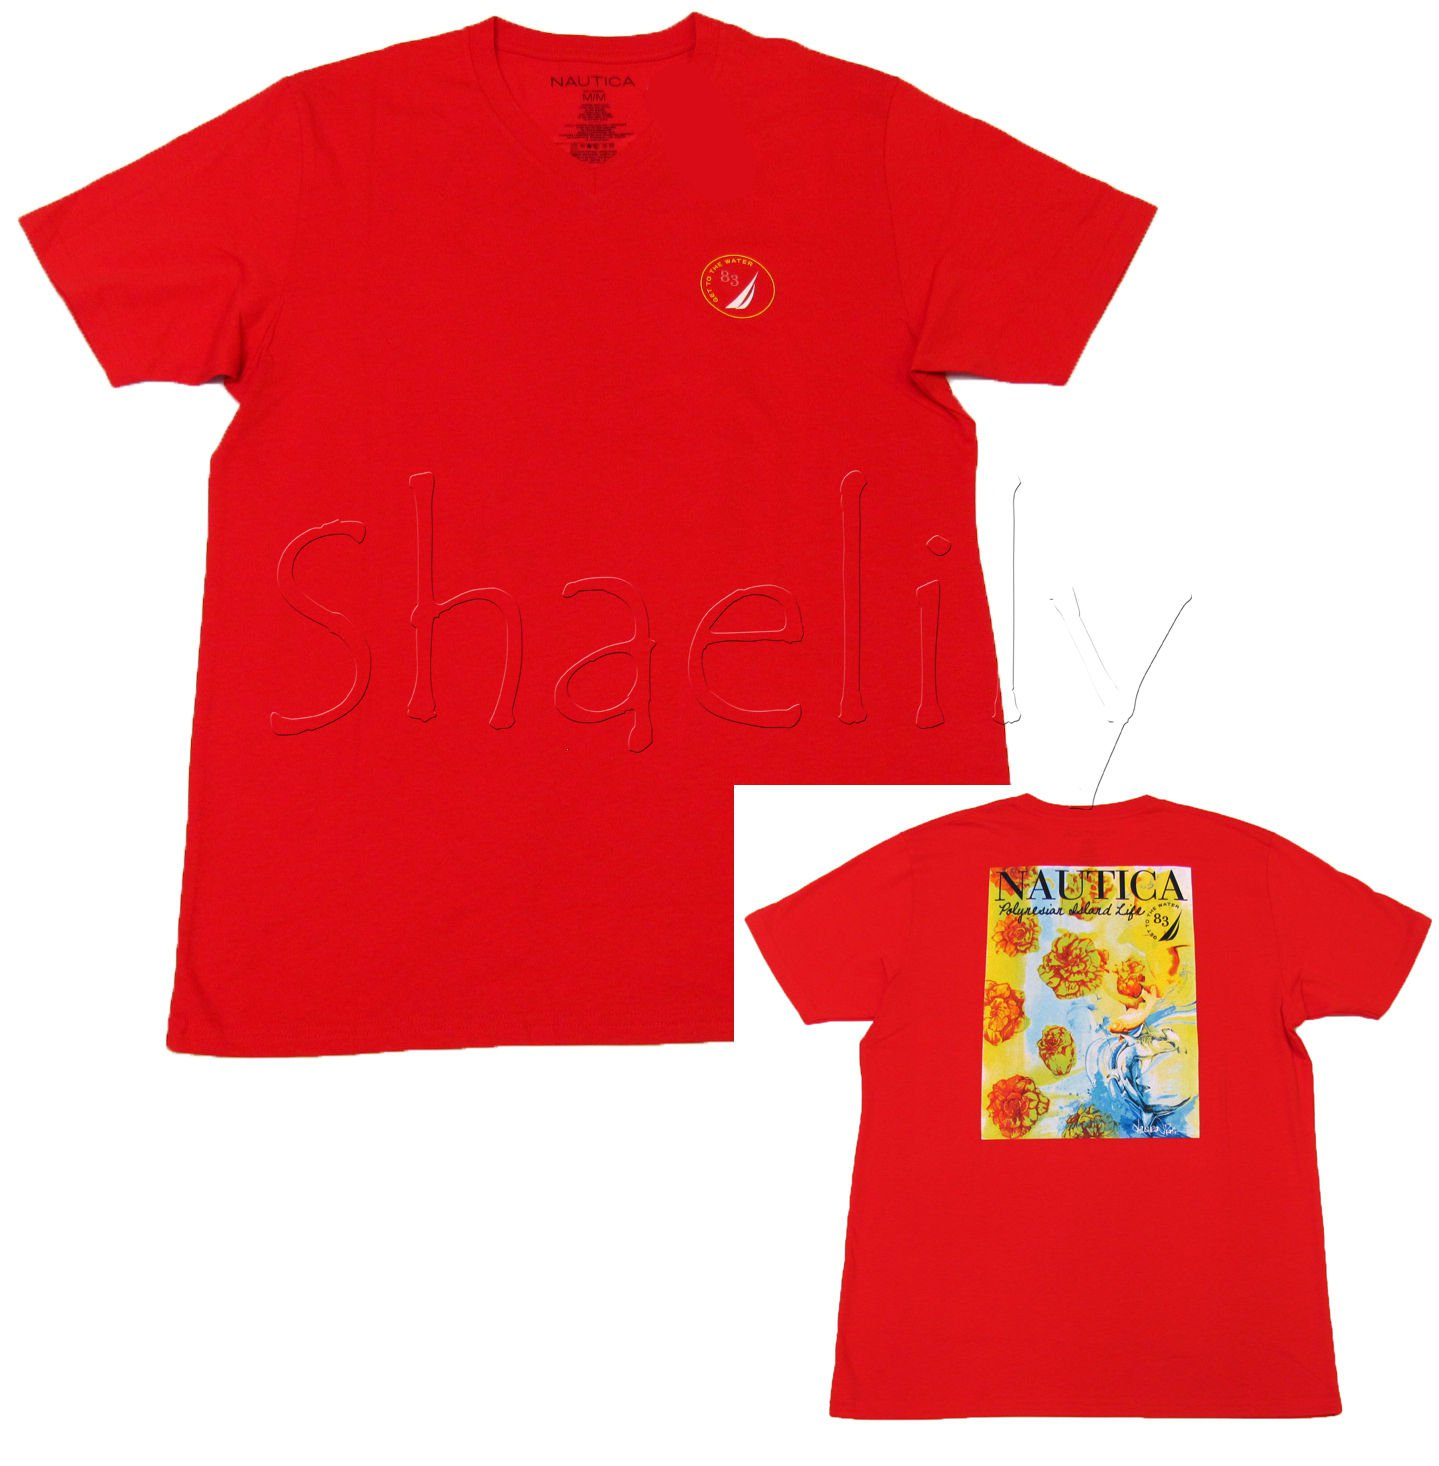 Nautica Mens M Red V-neck Tee Shirt Polynesian Island Life Short Sleeve T-shirt